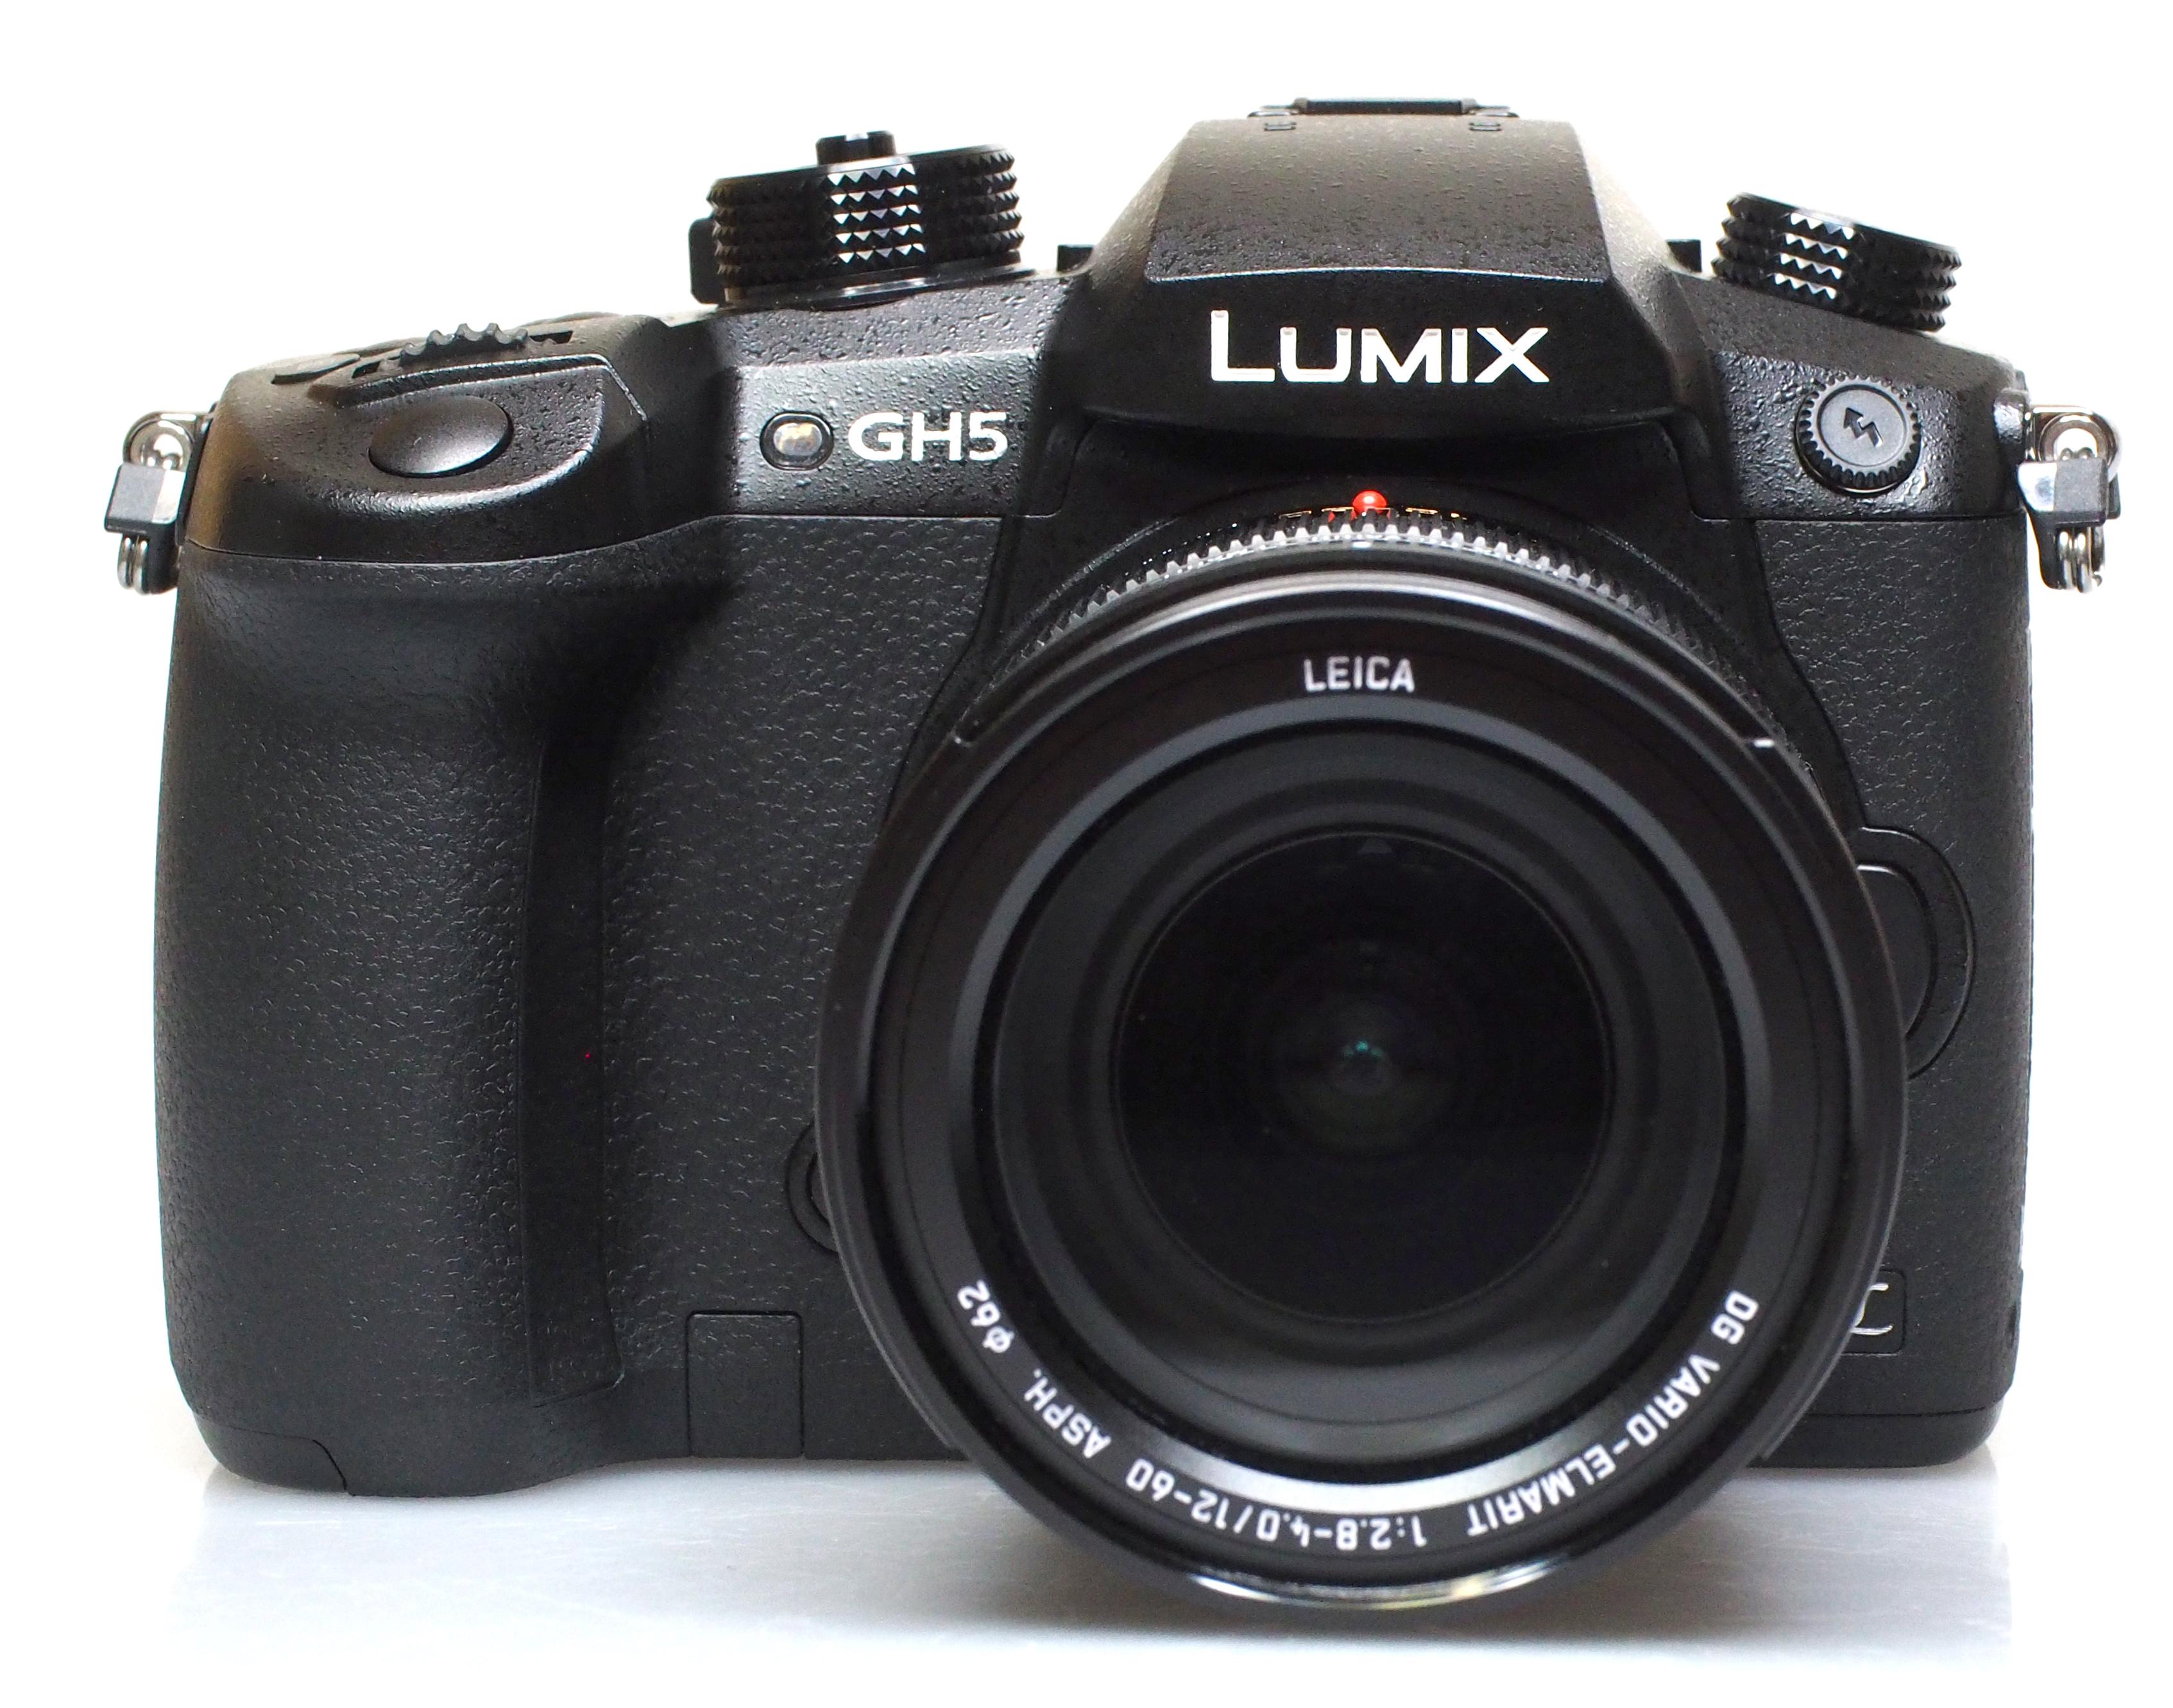 Panasonic Lumix Gh5 Expert Review